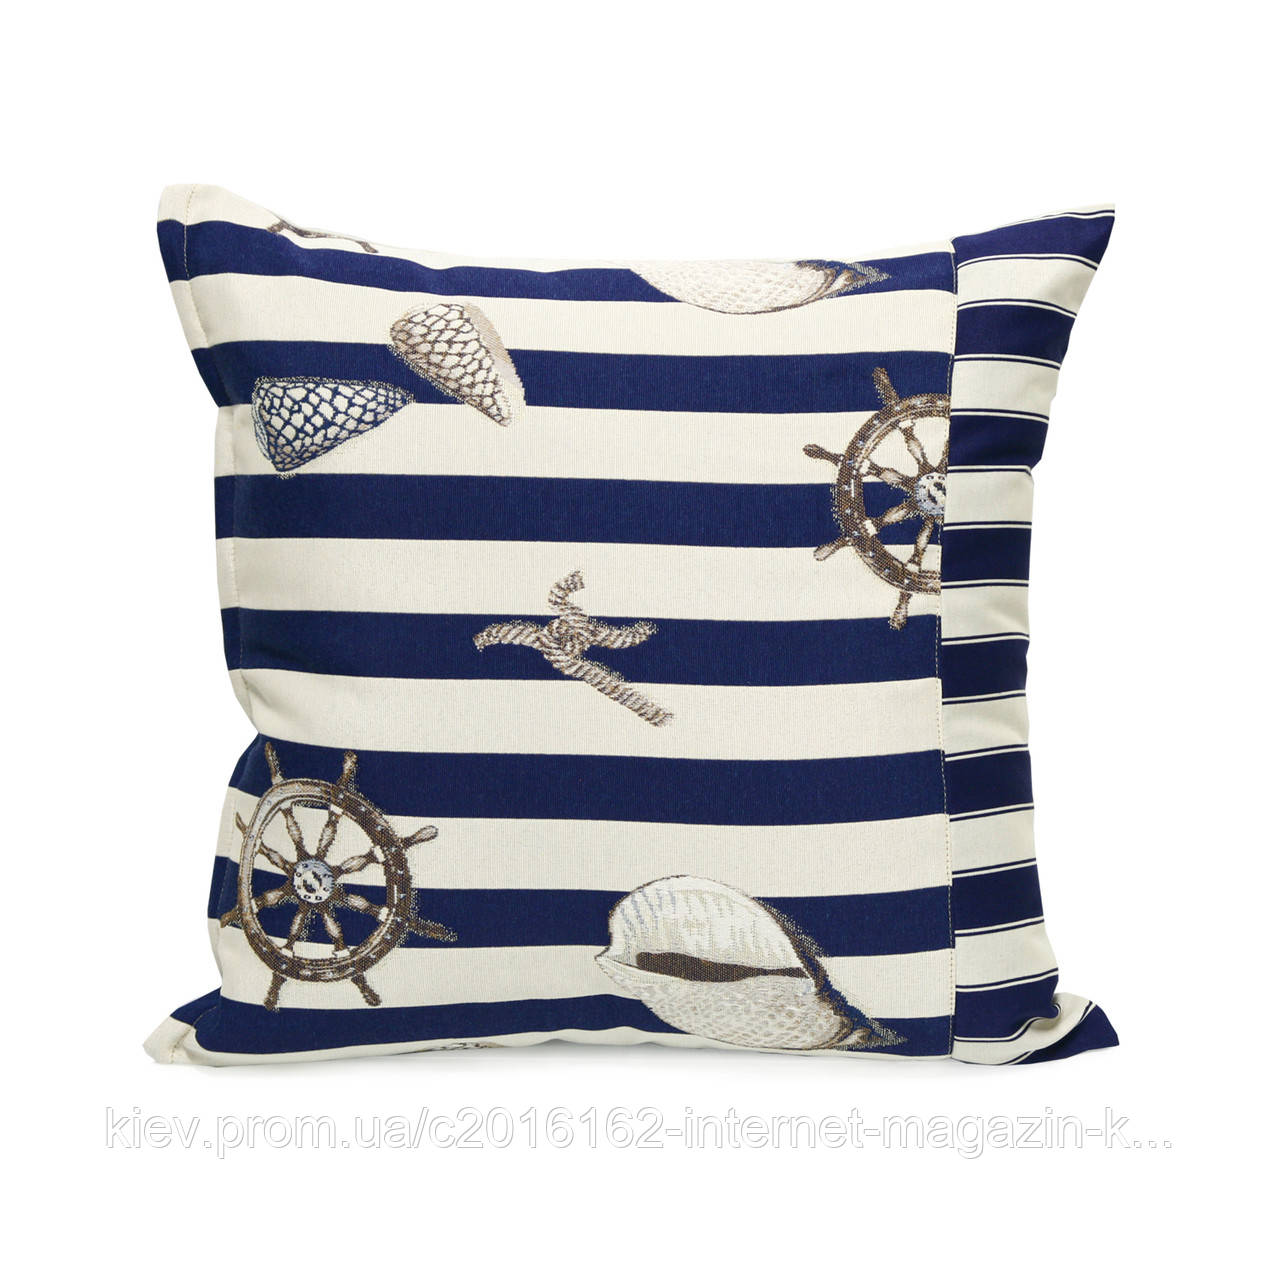 Подушка для стула Home4You HOLLY  45x45cm  бежевая с морским мотивом